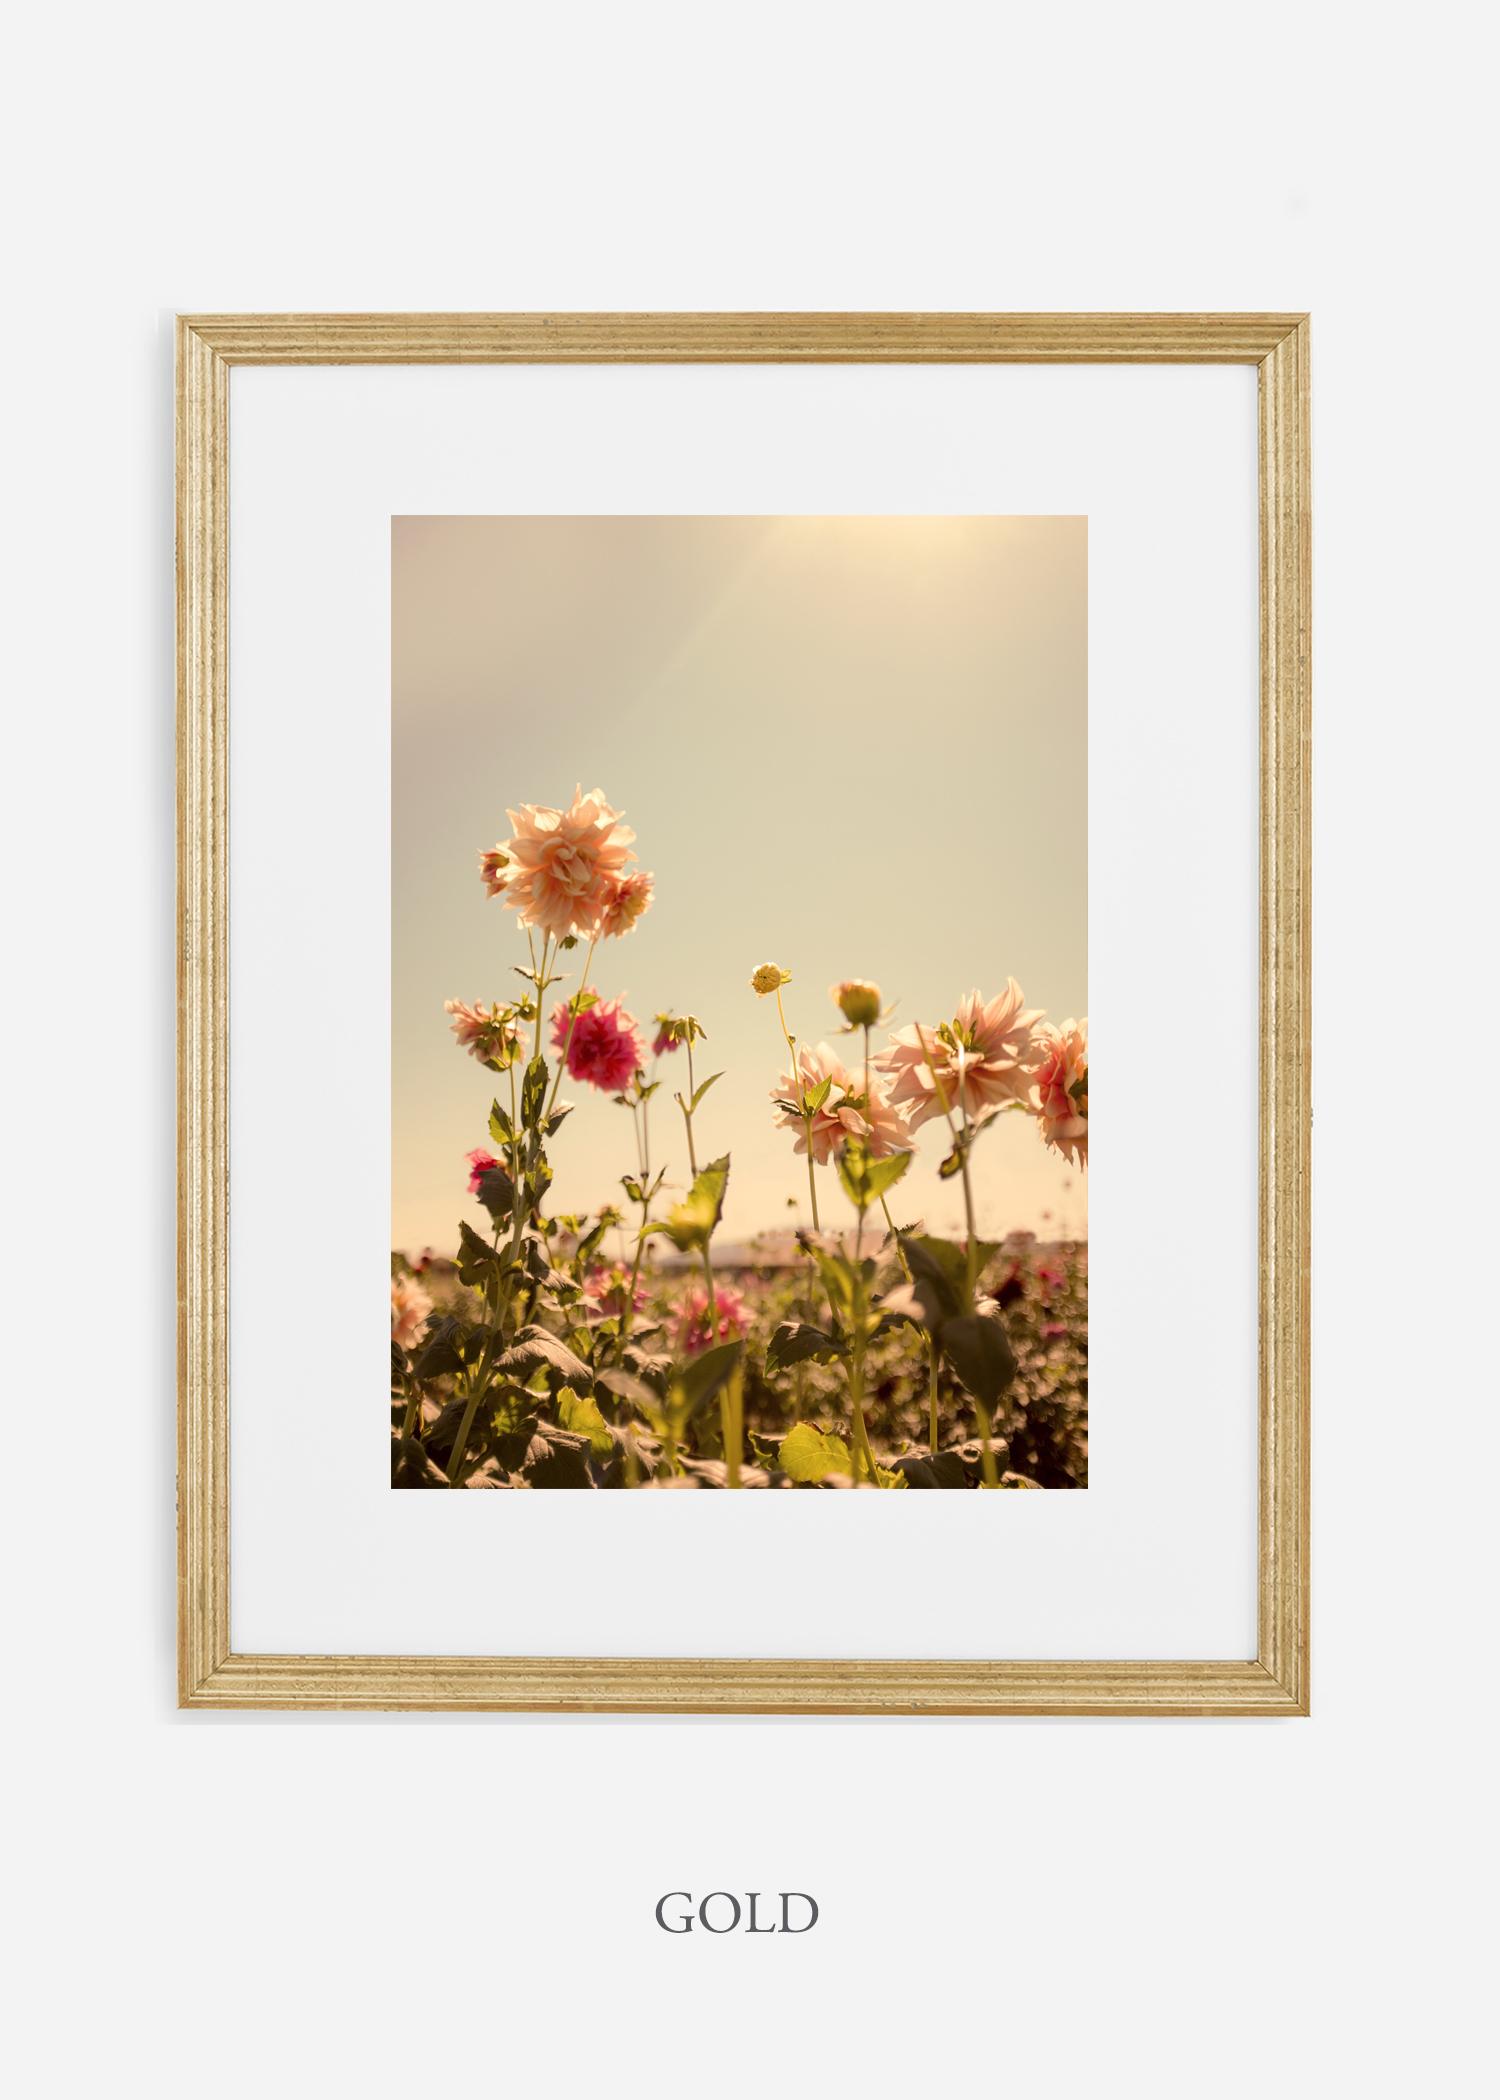 DahliaNo.3_goldframe__No.1_interiordesign_botanicalprint_art.jpg